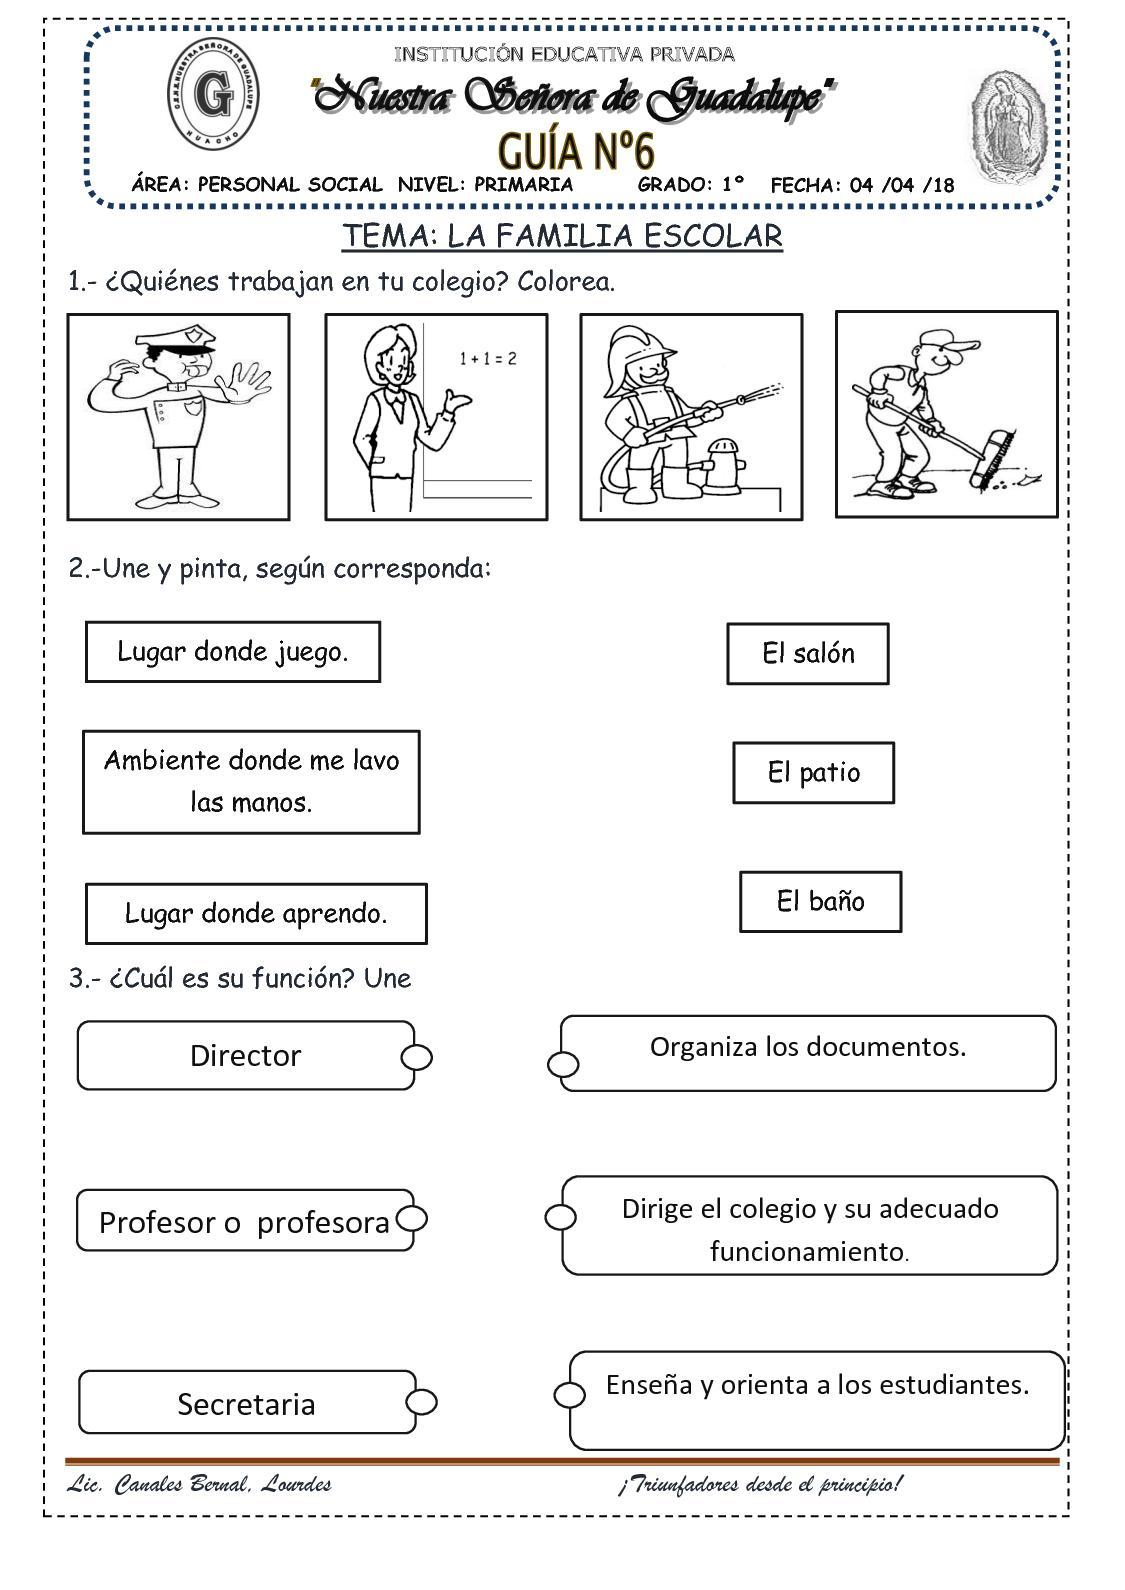 La Familia Escolar(06) - CALAMEO Downloader